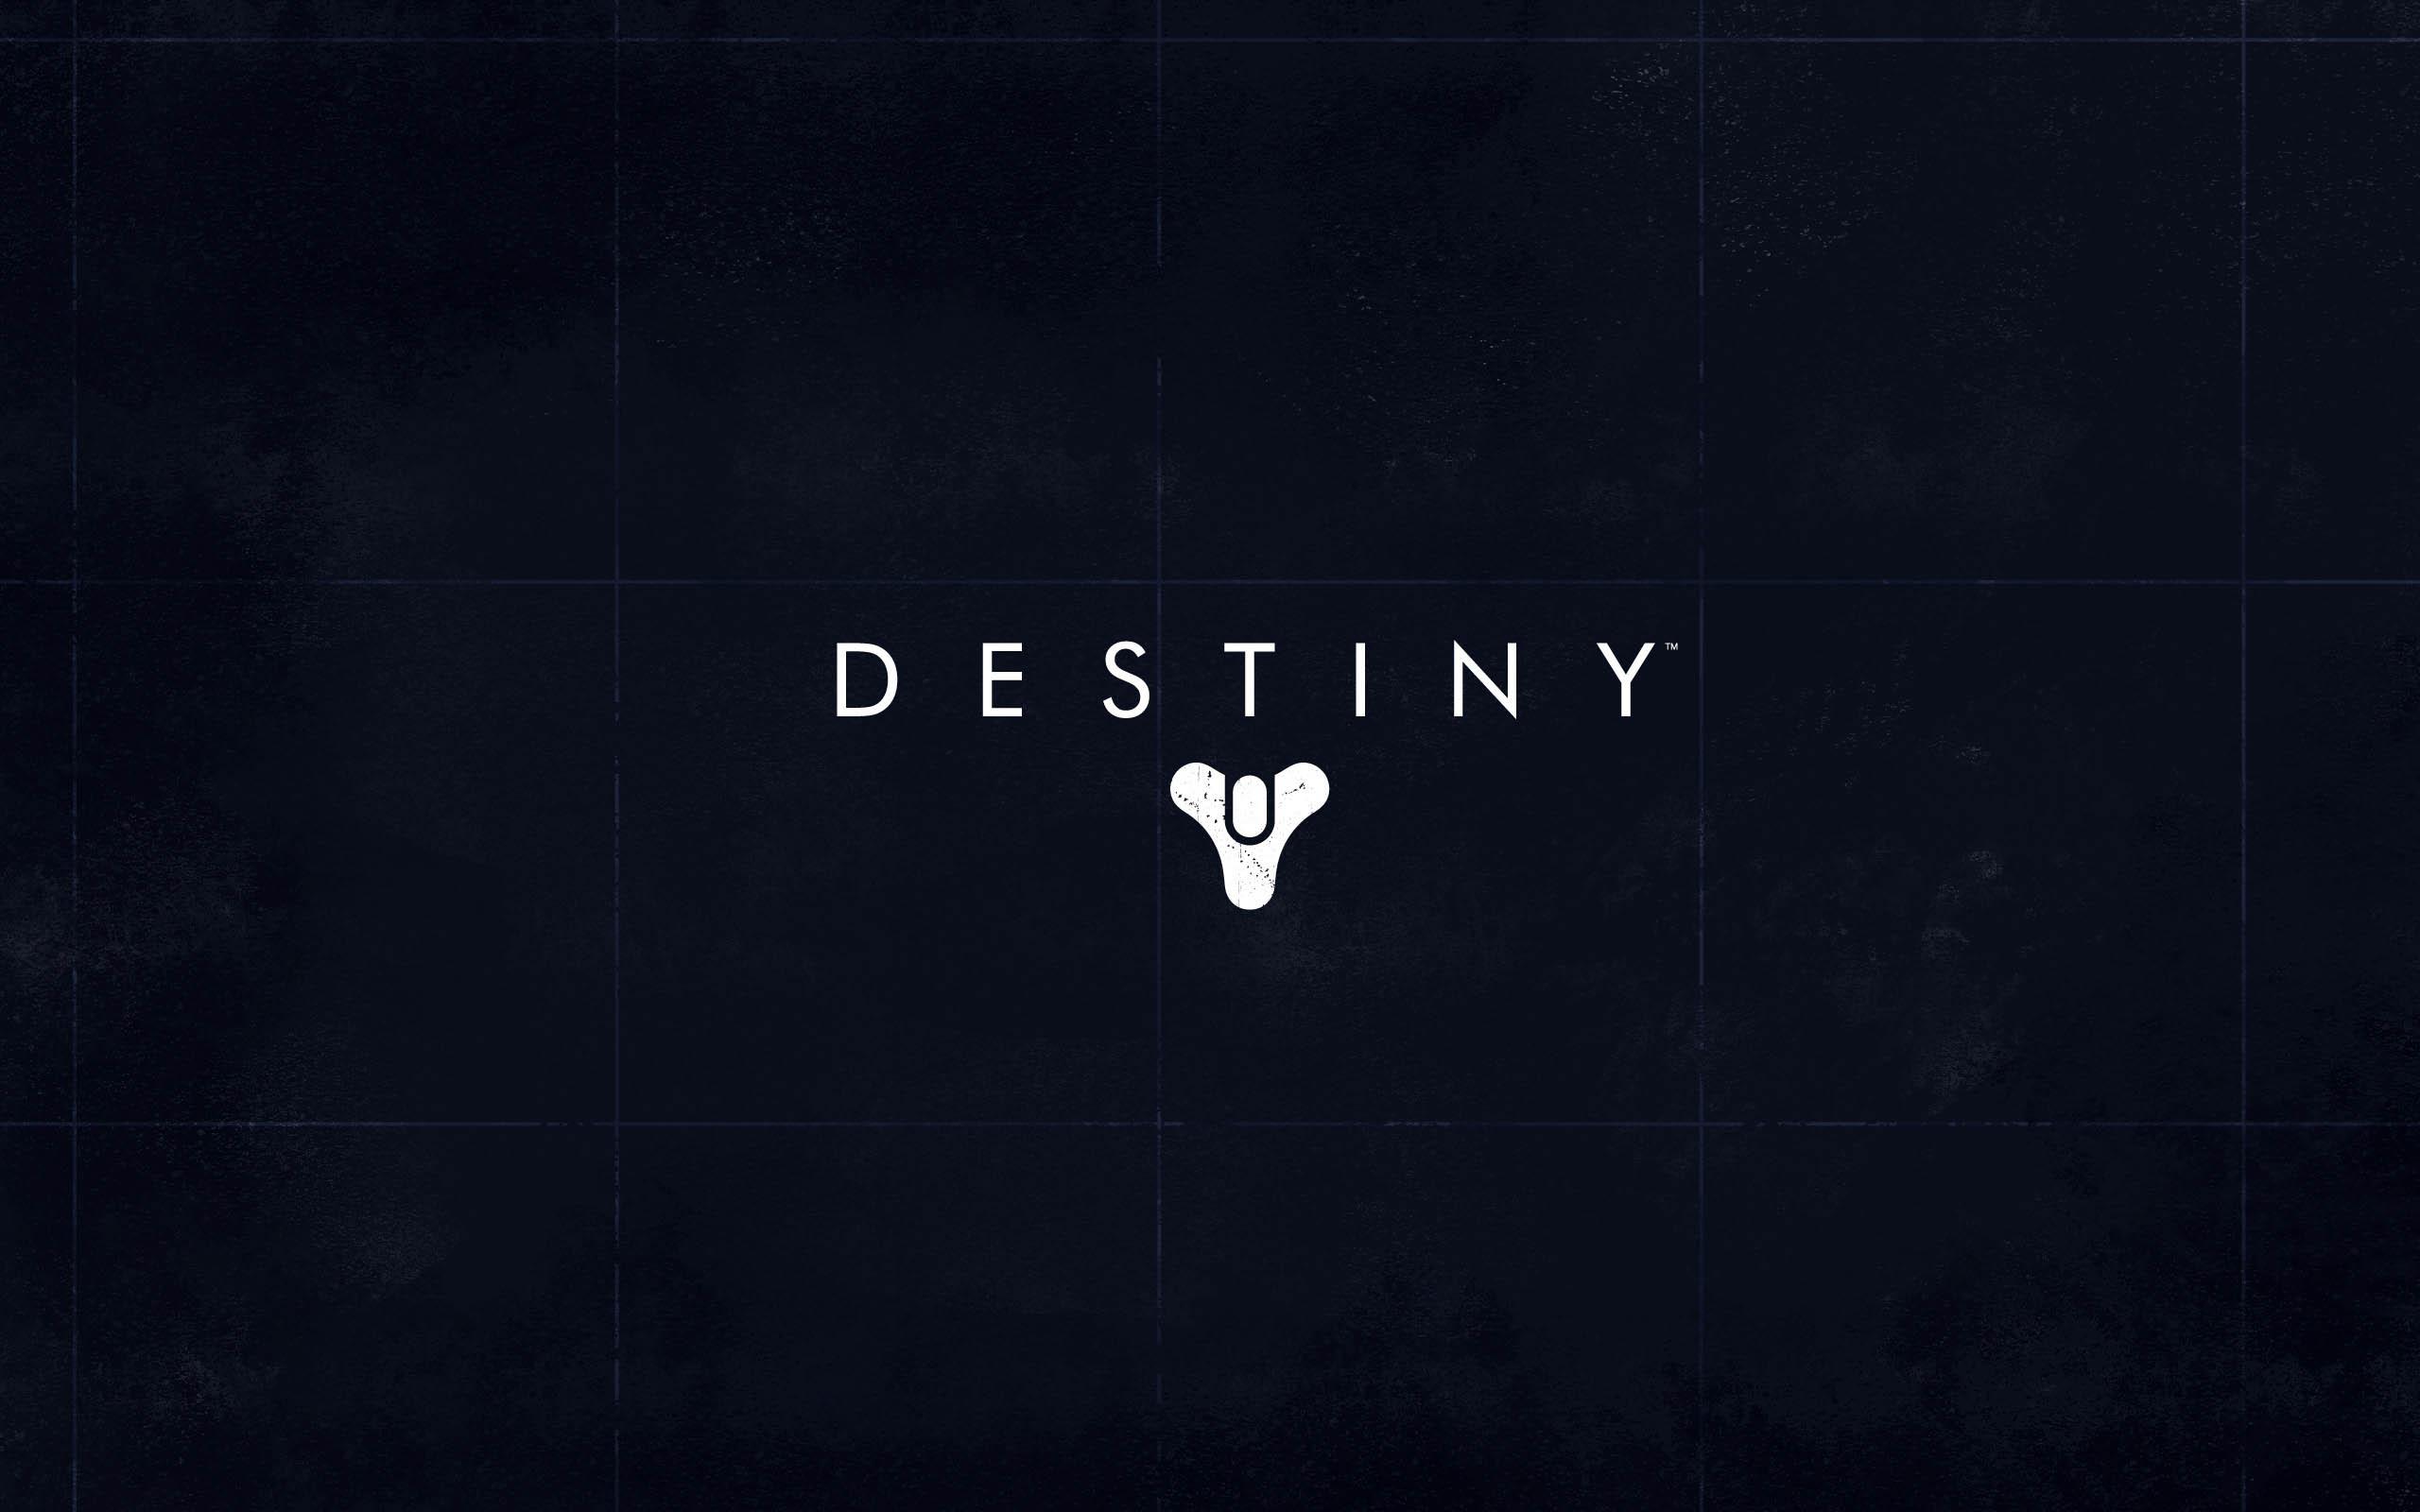 destiny logo hd - photo #16